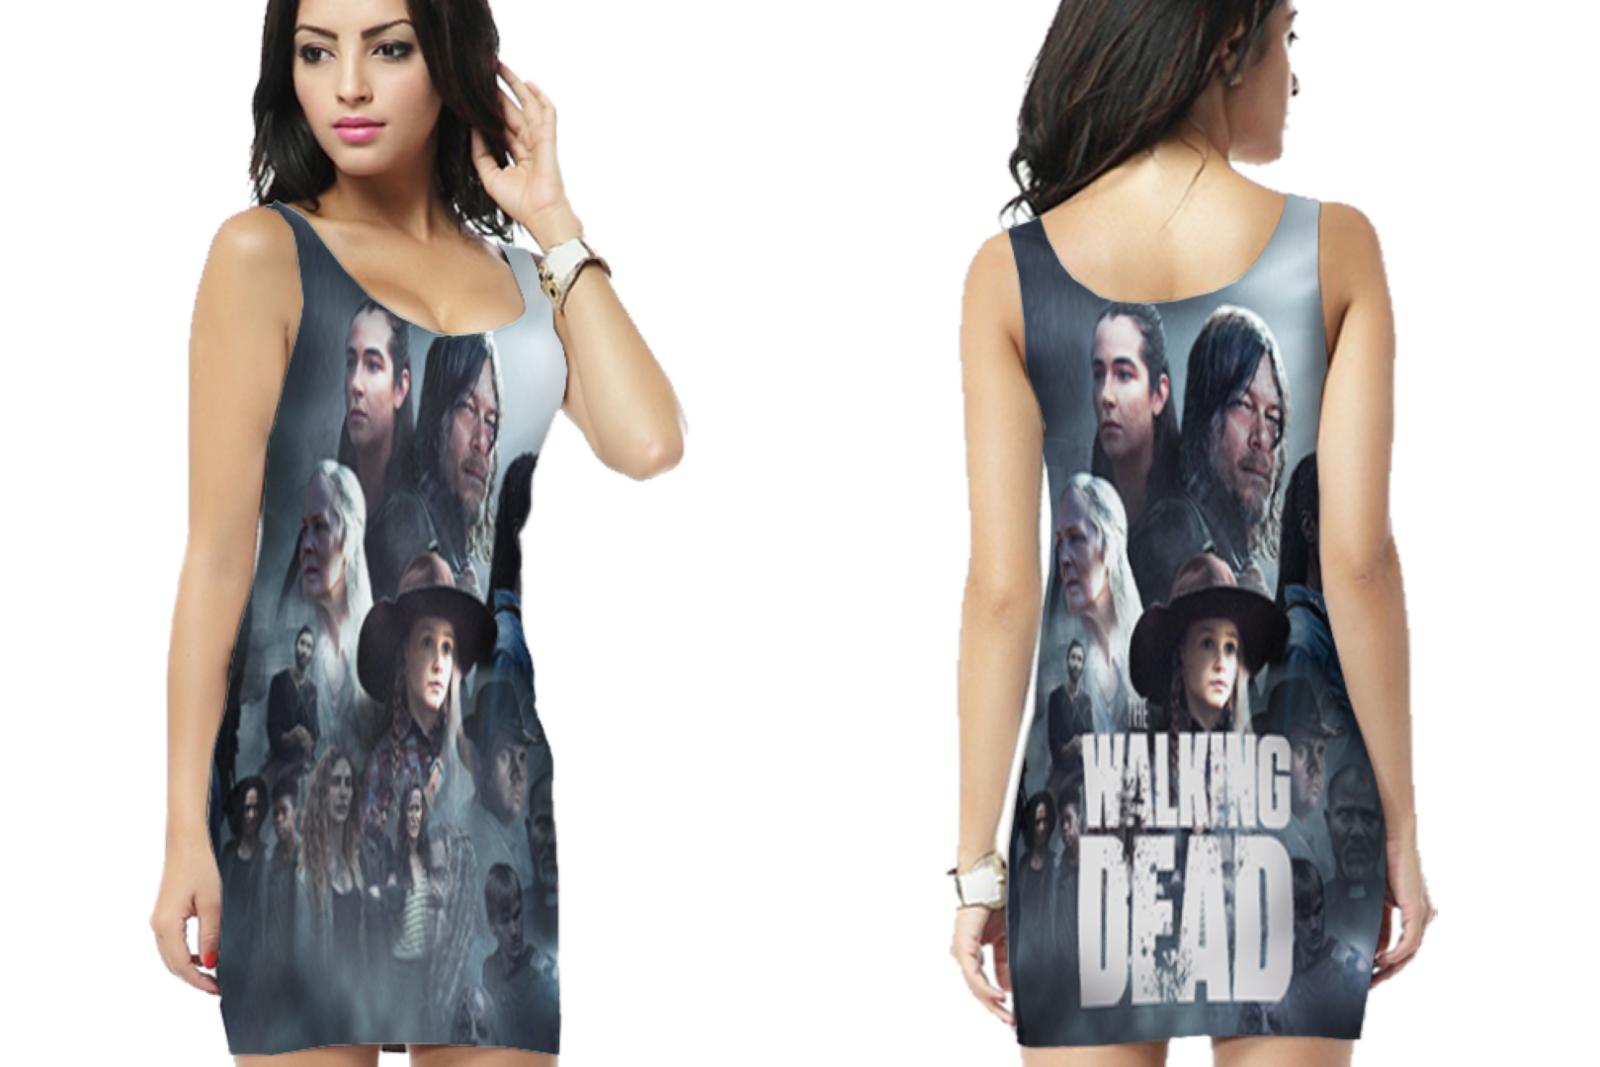 THE WALKING DEAD WOMENS BODYCON SLEEVELESS SHORT MINI DRESS